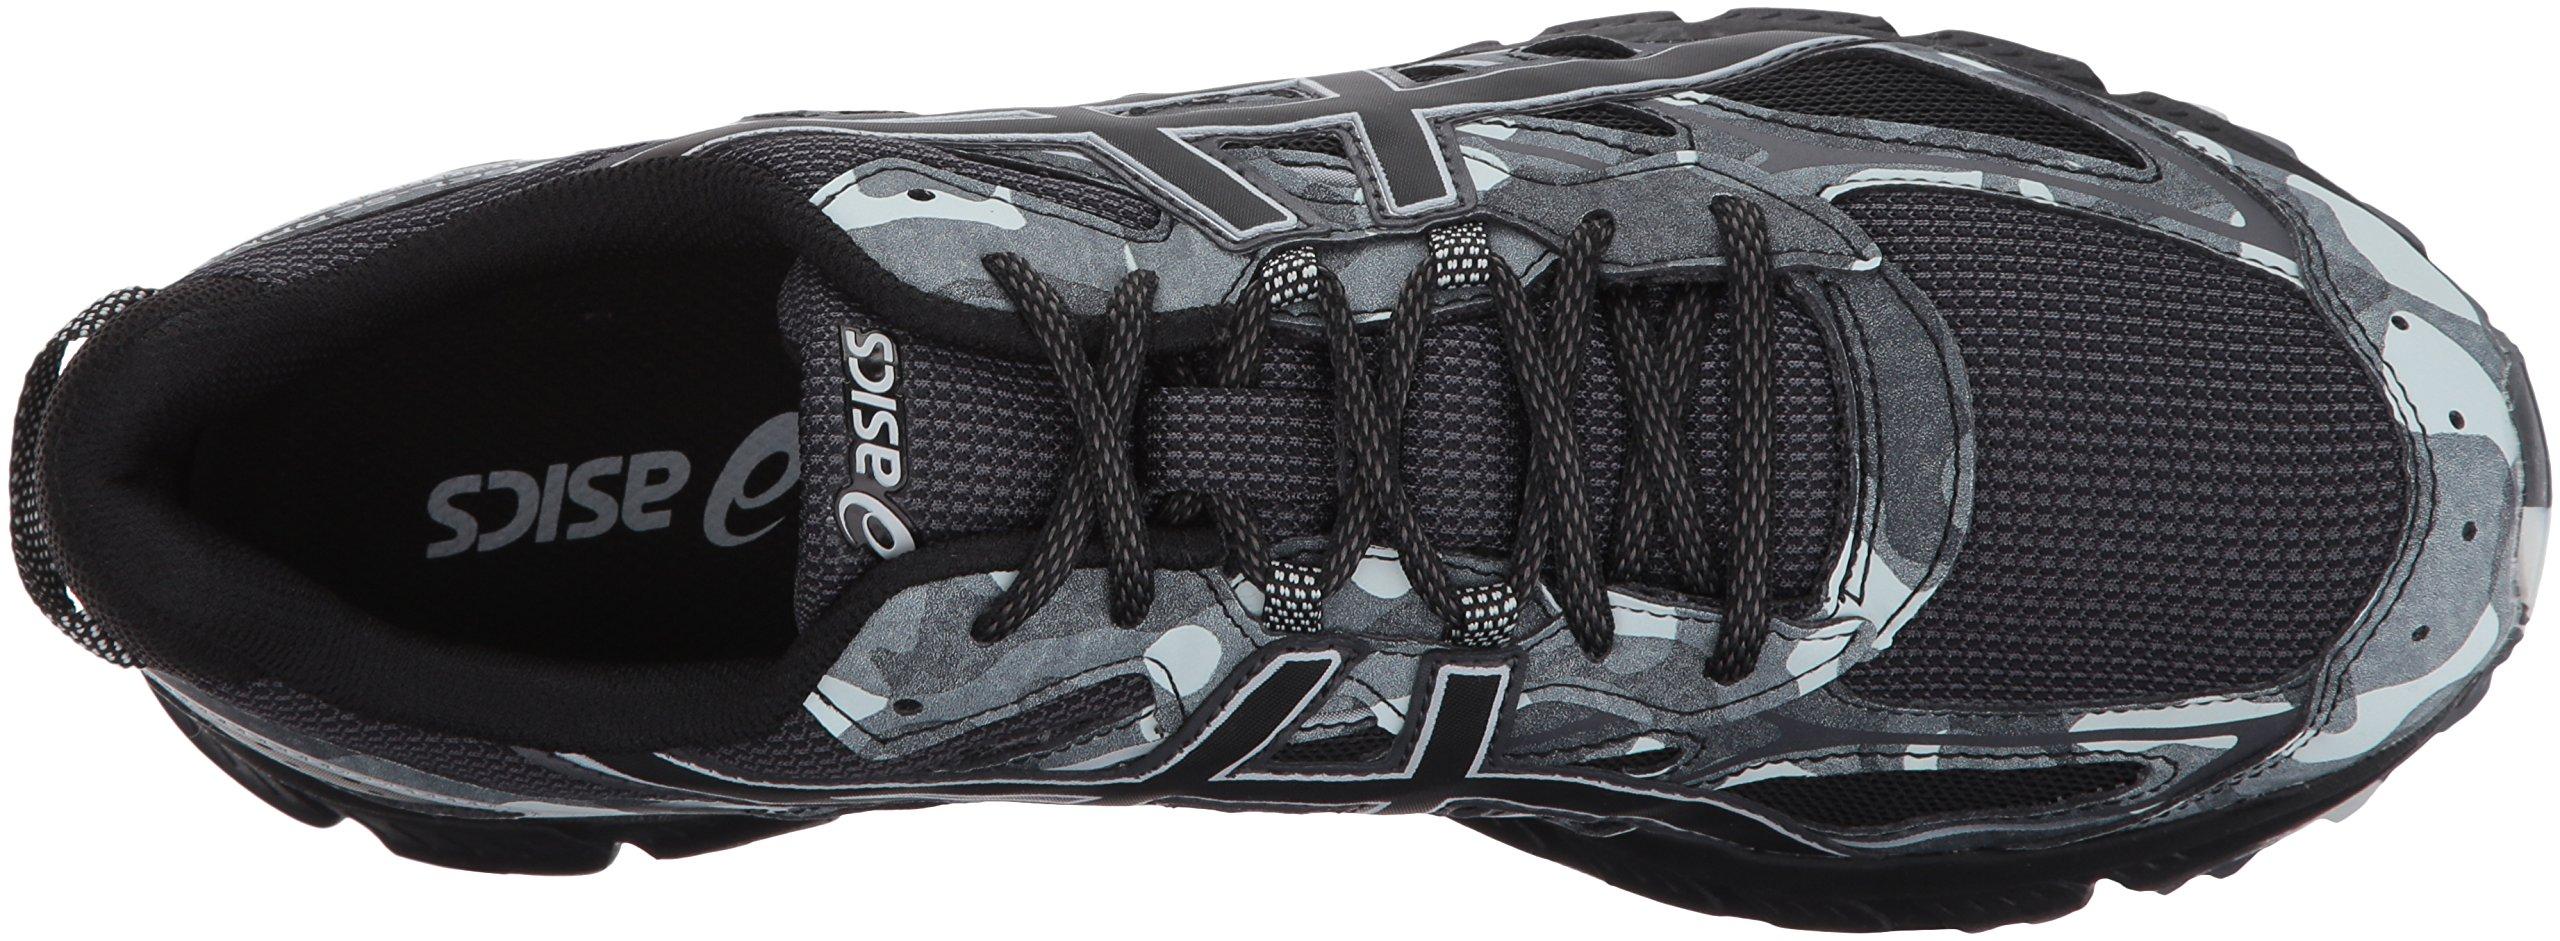 online store 9dd18 989ff ASICS Mens Gel-Scram 3 Running Shoe, Black/Glacier Grey, 10 ...